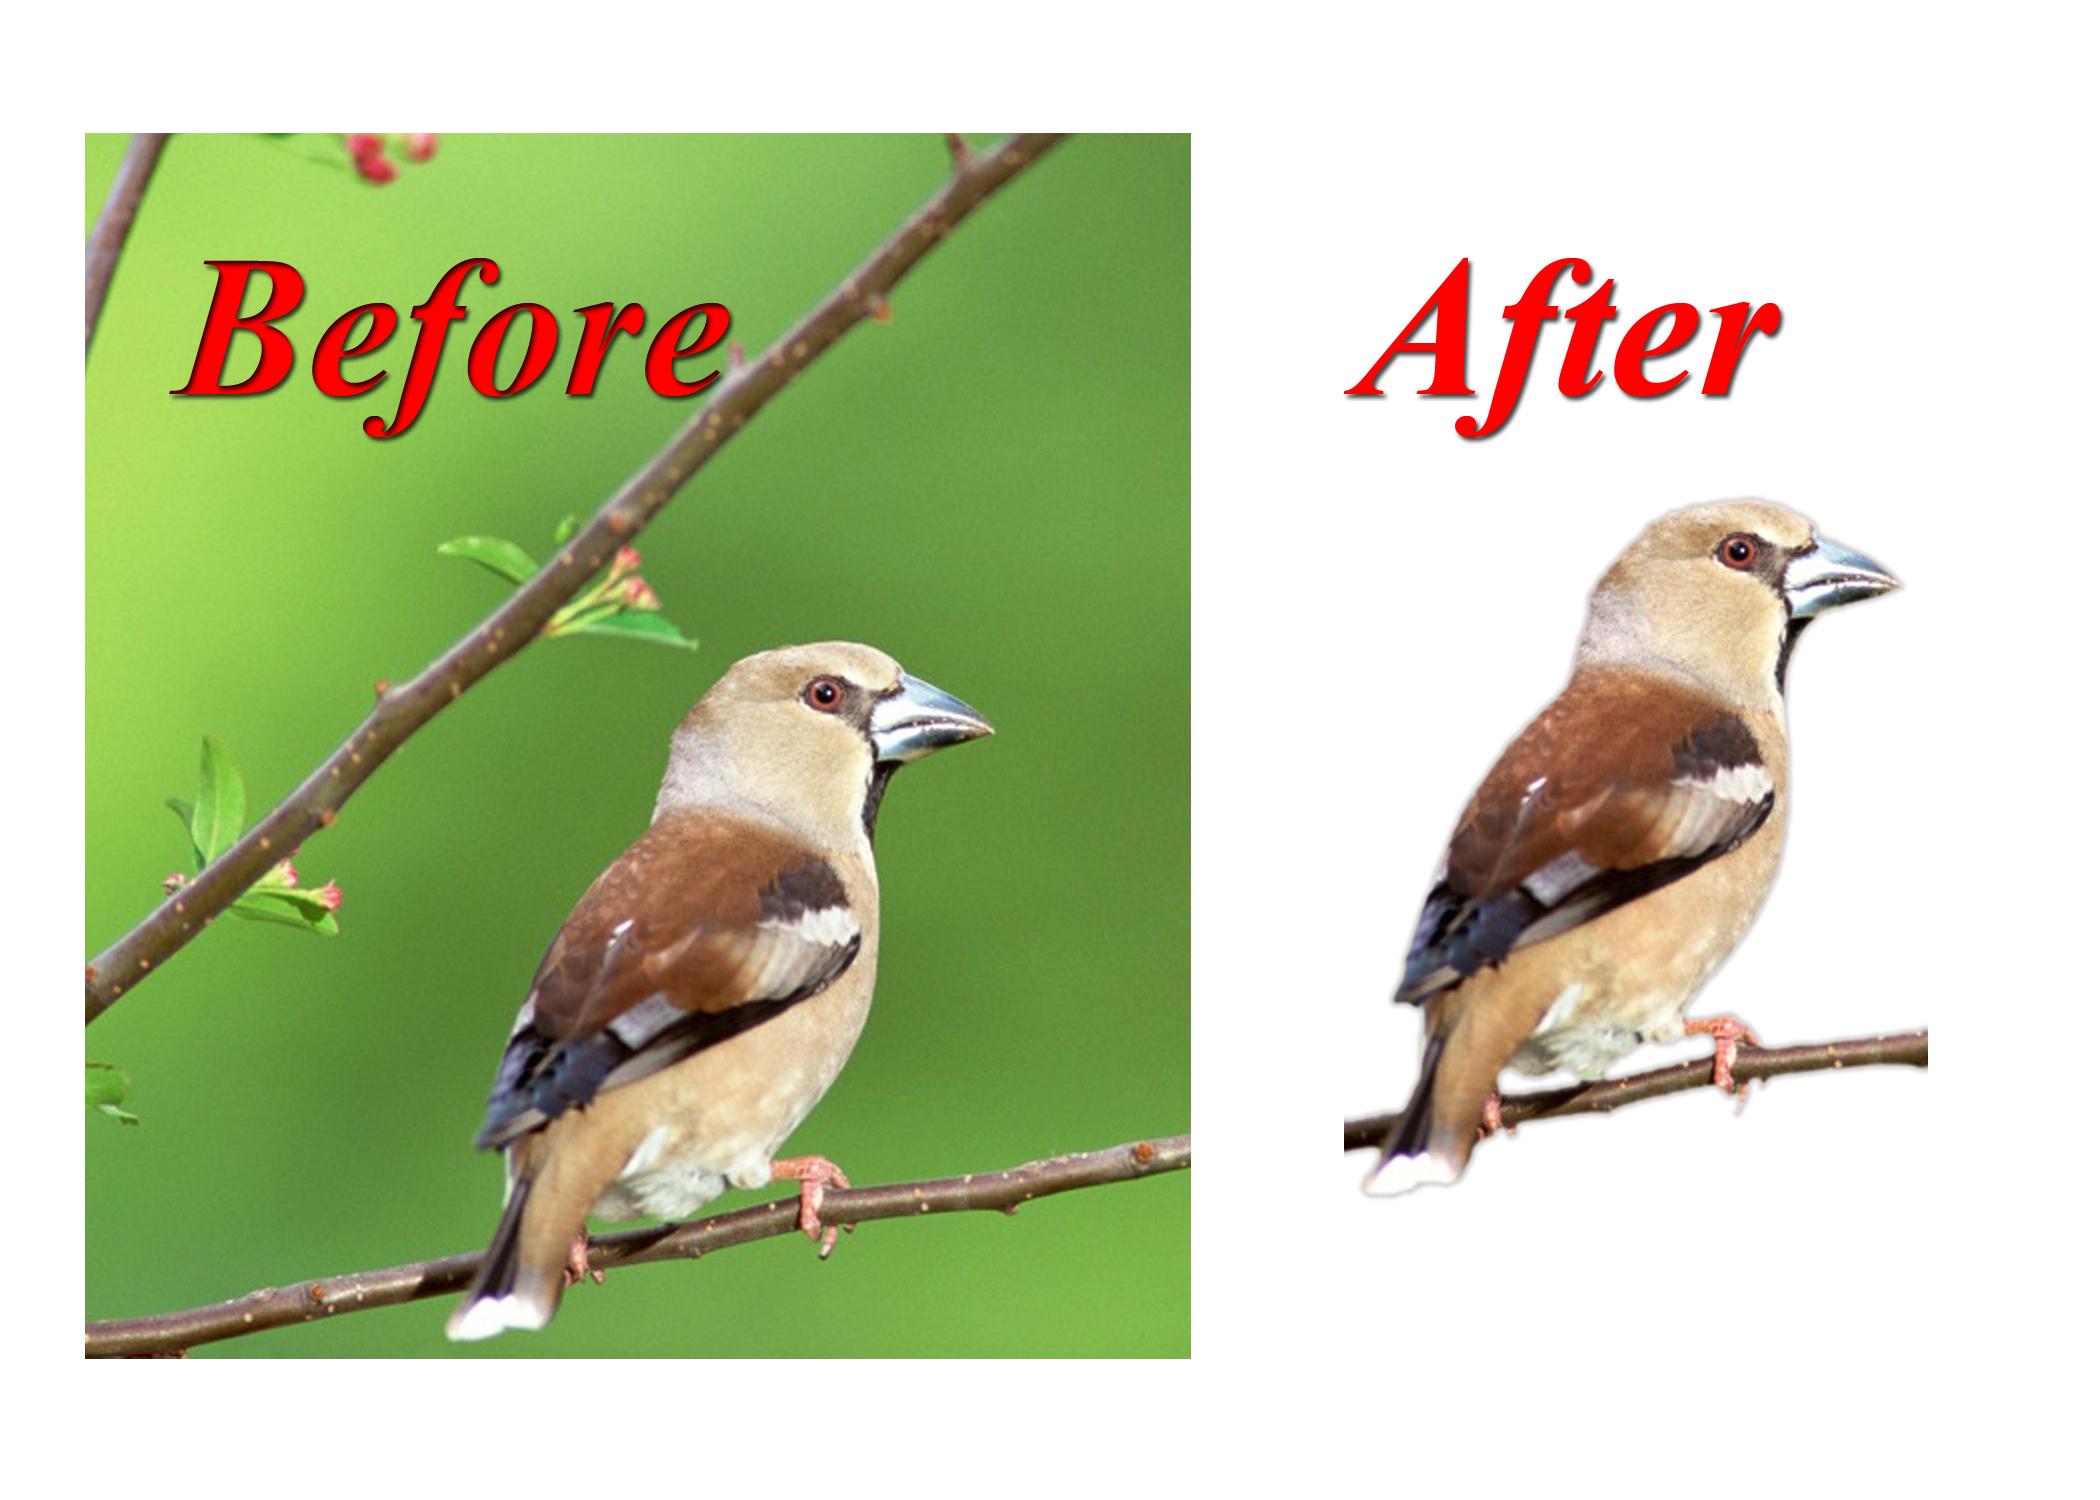 Remove 100+ image background professionally